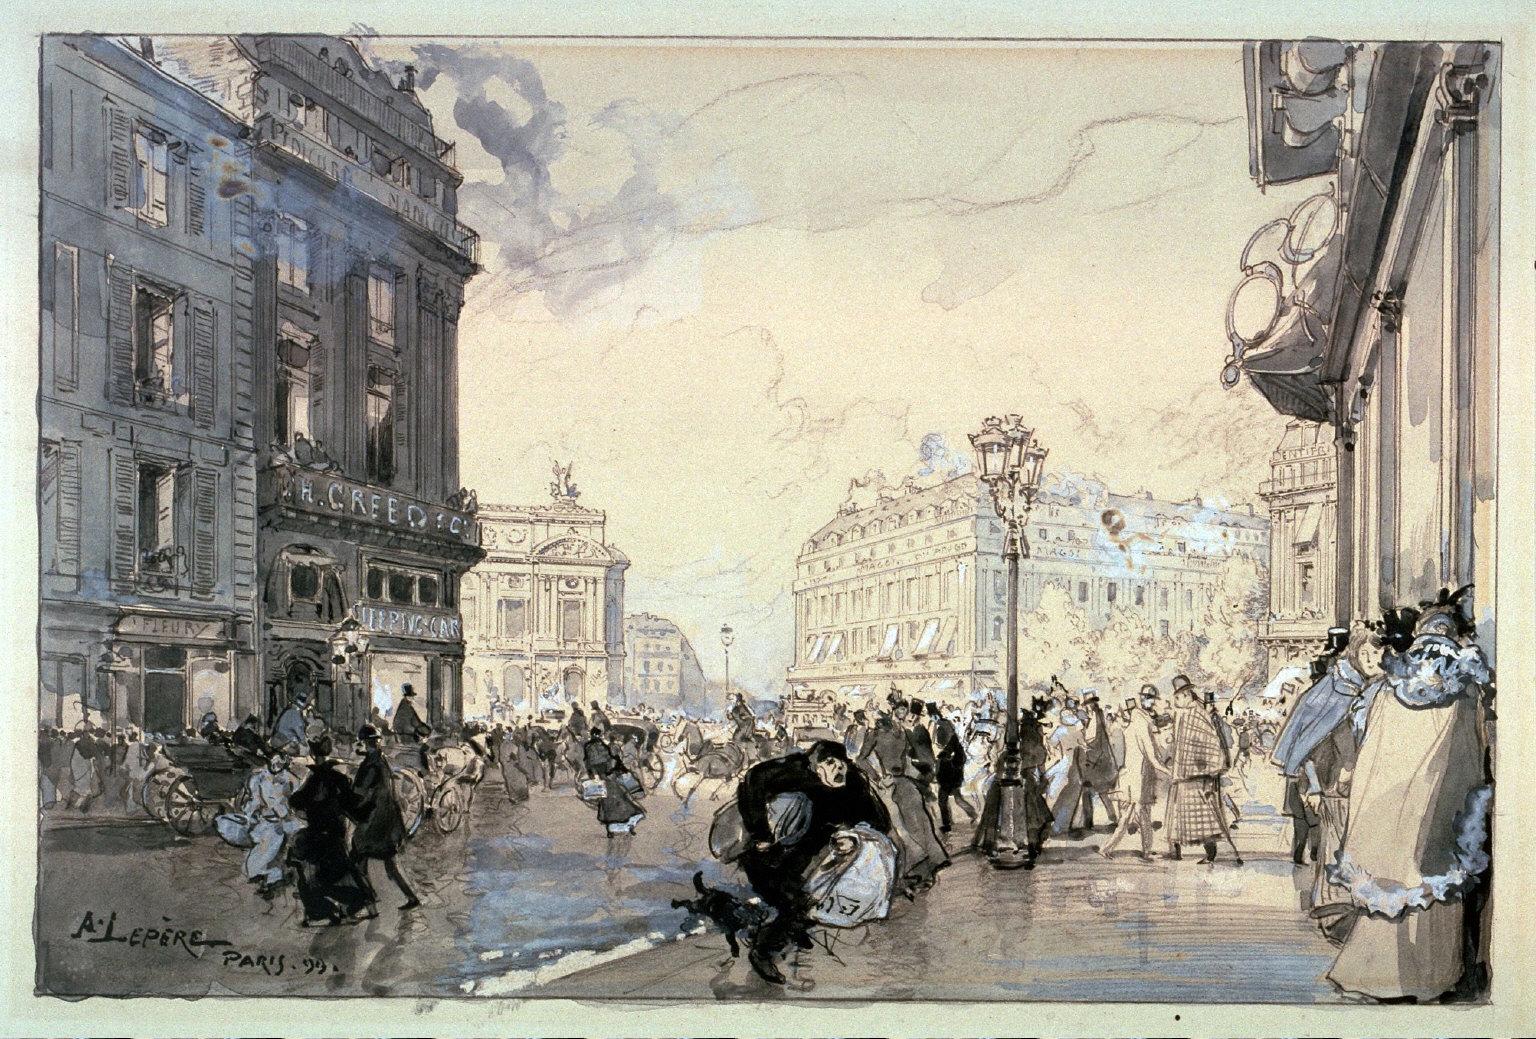 Brouillard (Fog), study for the introductory illustration for the chapterEffets de brouillard: Paris-Londres, on page 134 of the book, Paysages et coins de rue by Jean Richepin (Paris: 1900)